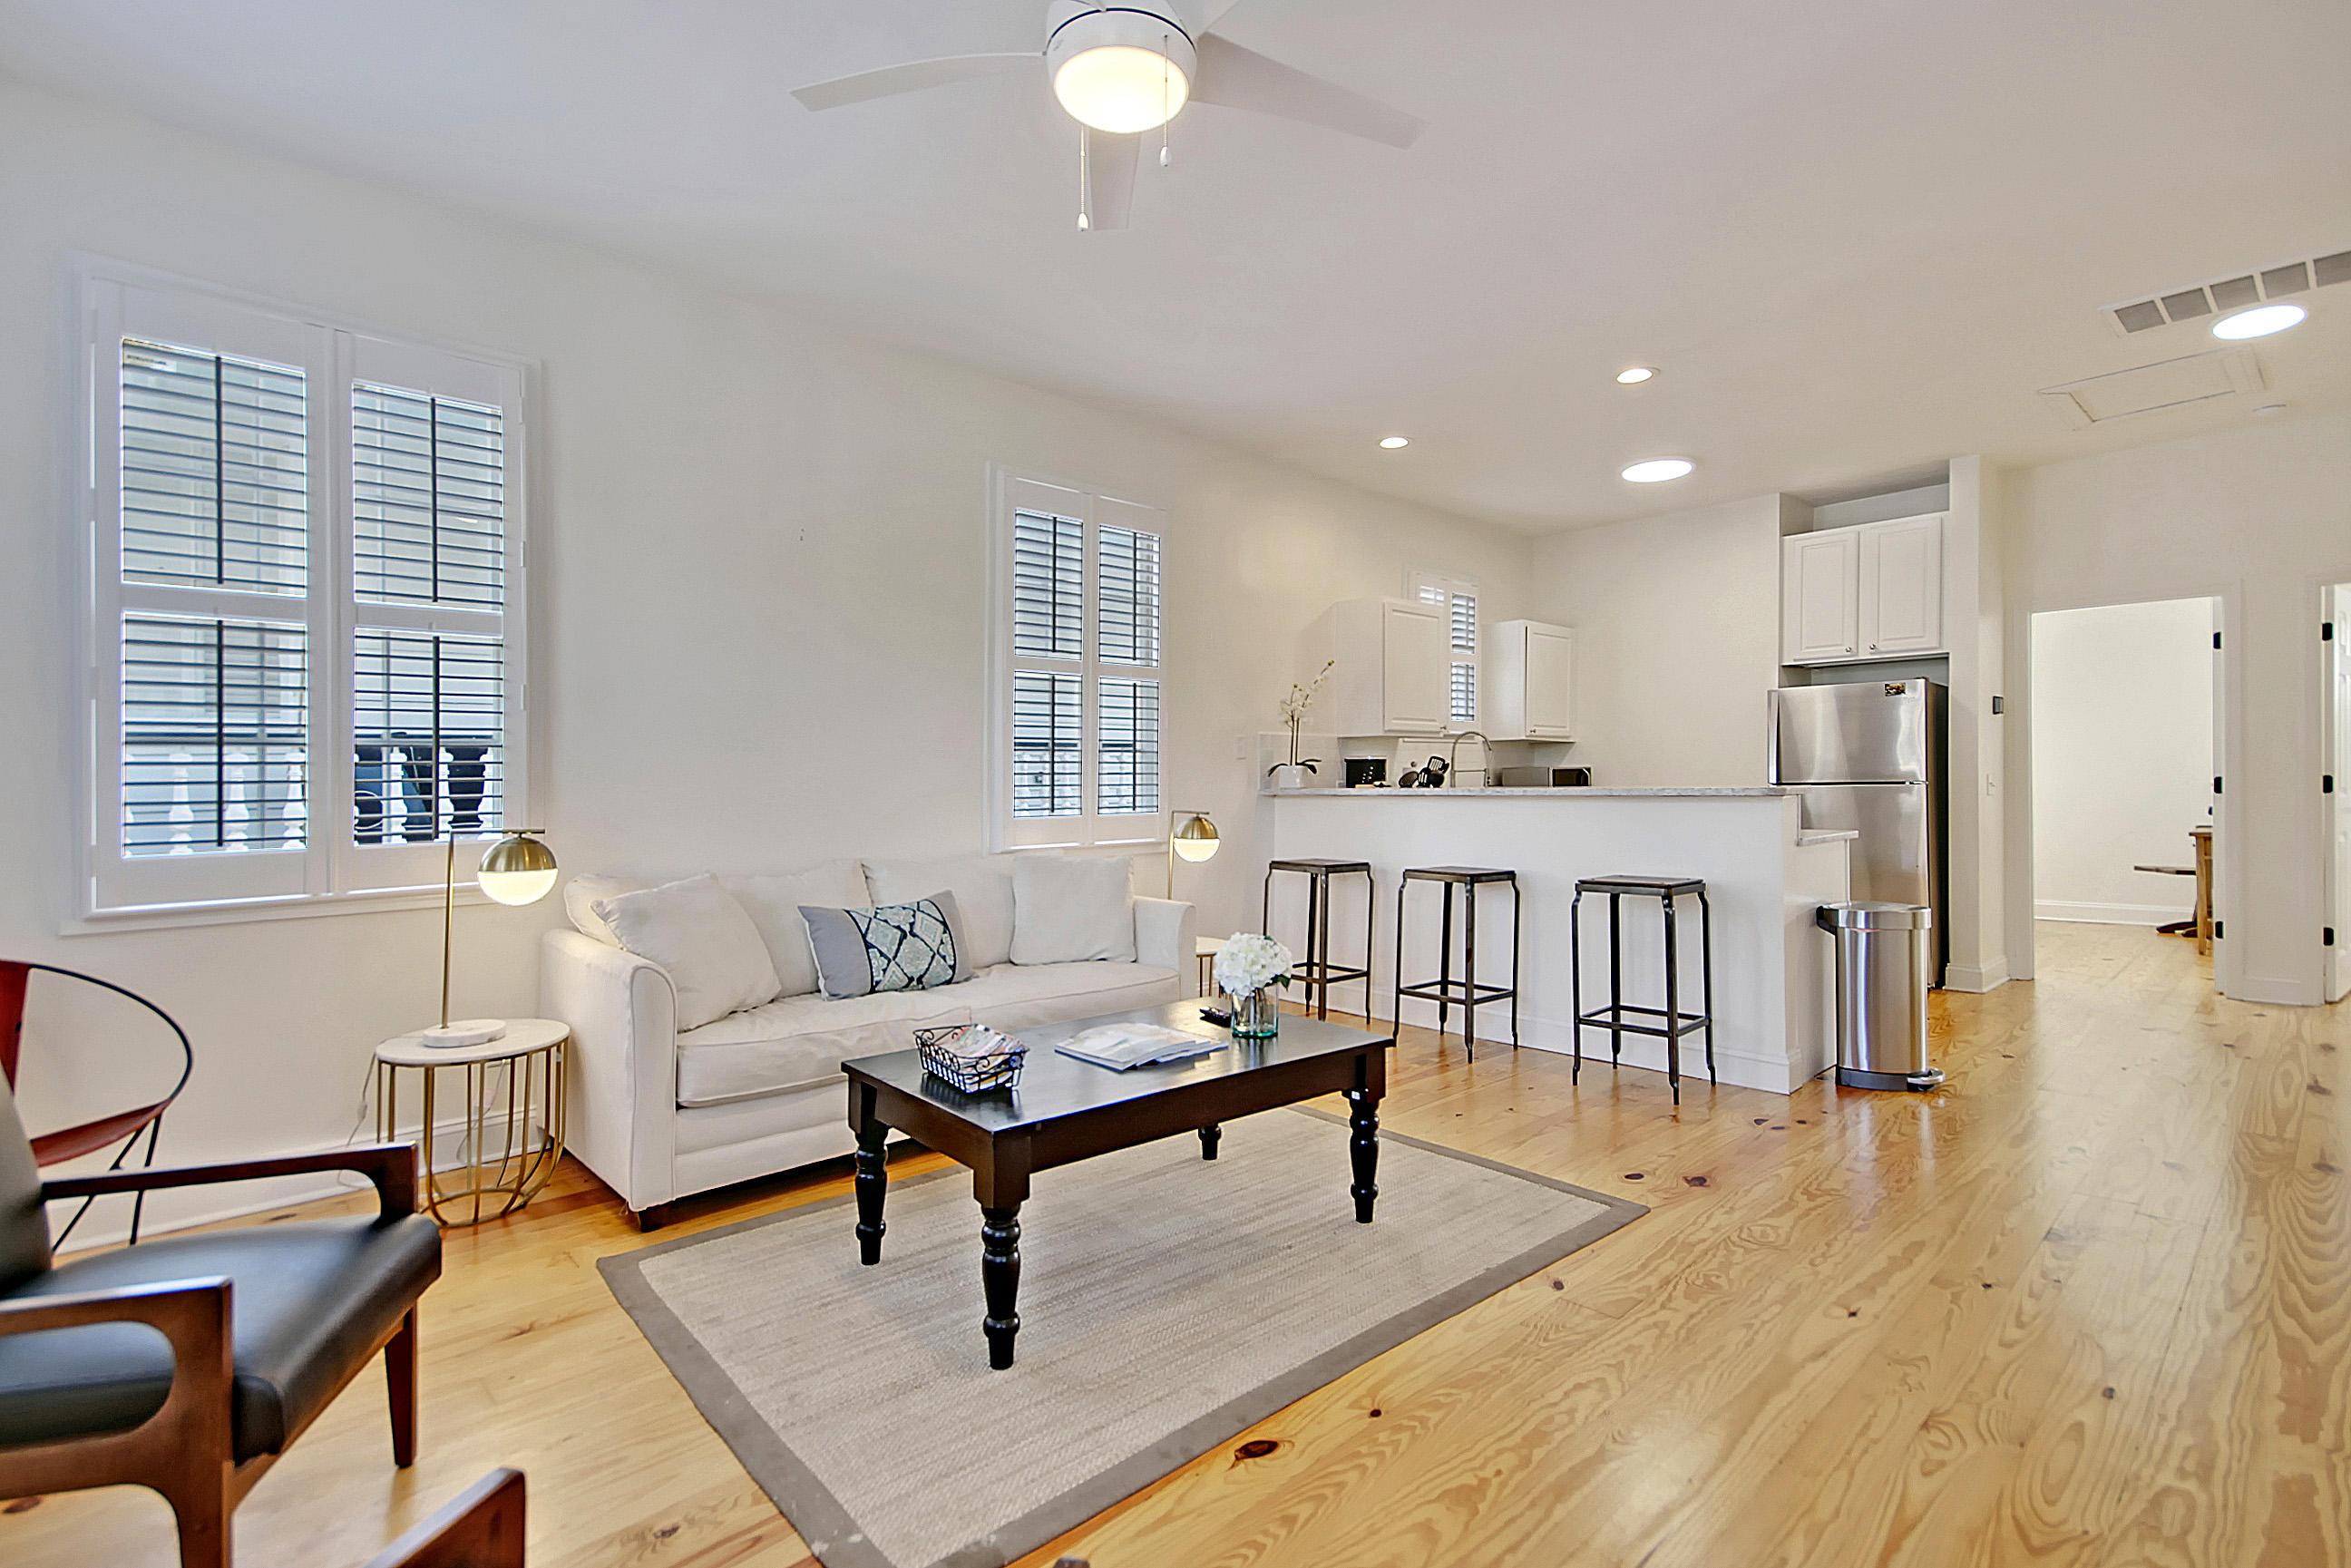 Cannonborough-Elliottborough Homes For Sale - 167 Spring, Charleston, SC - 0